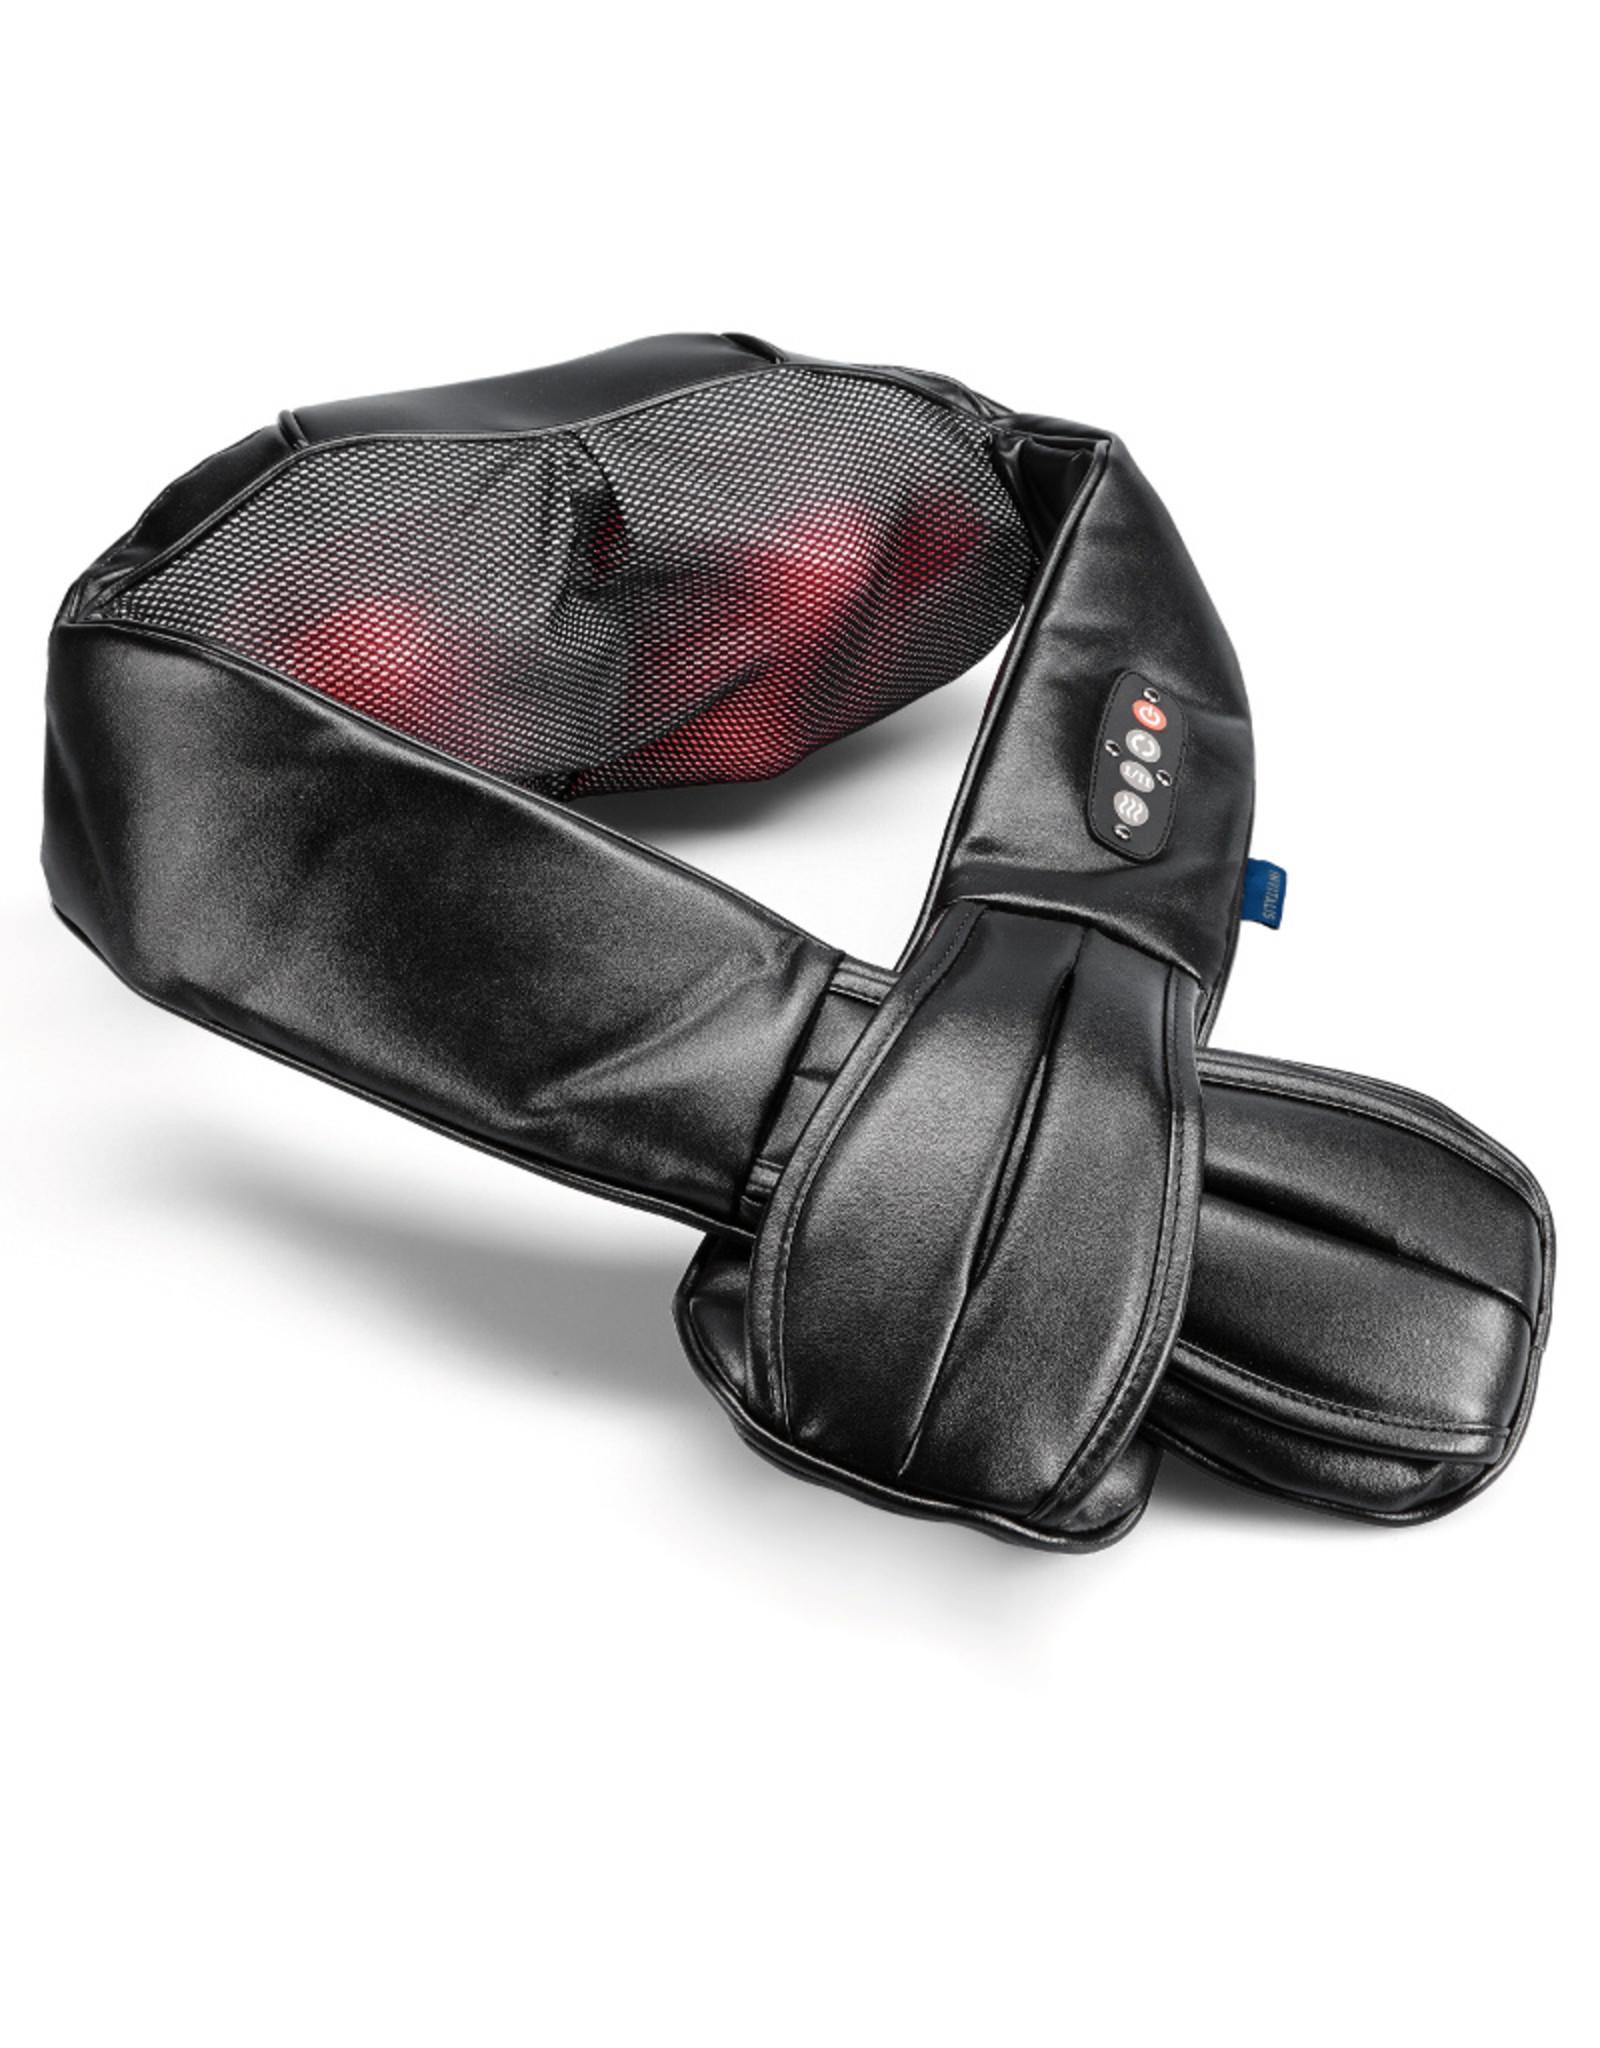 INVITALIS UK Vitalymed Flexi- Black with UK Adapter